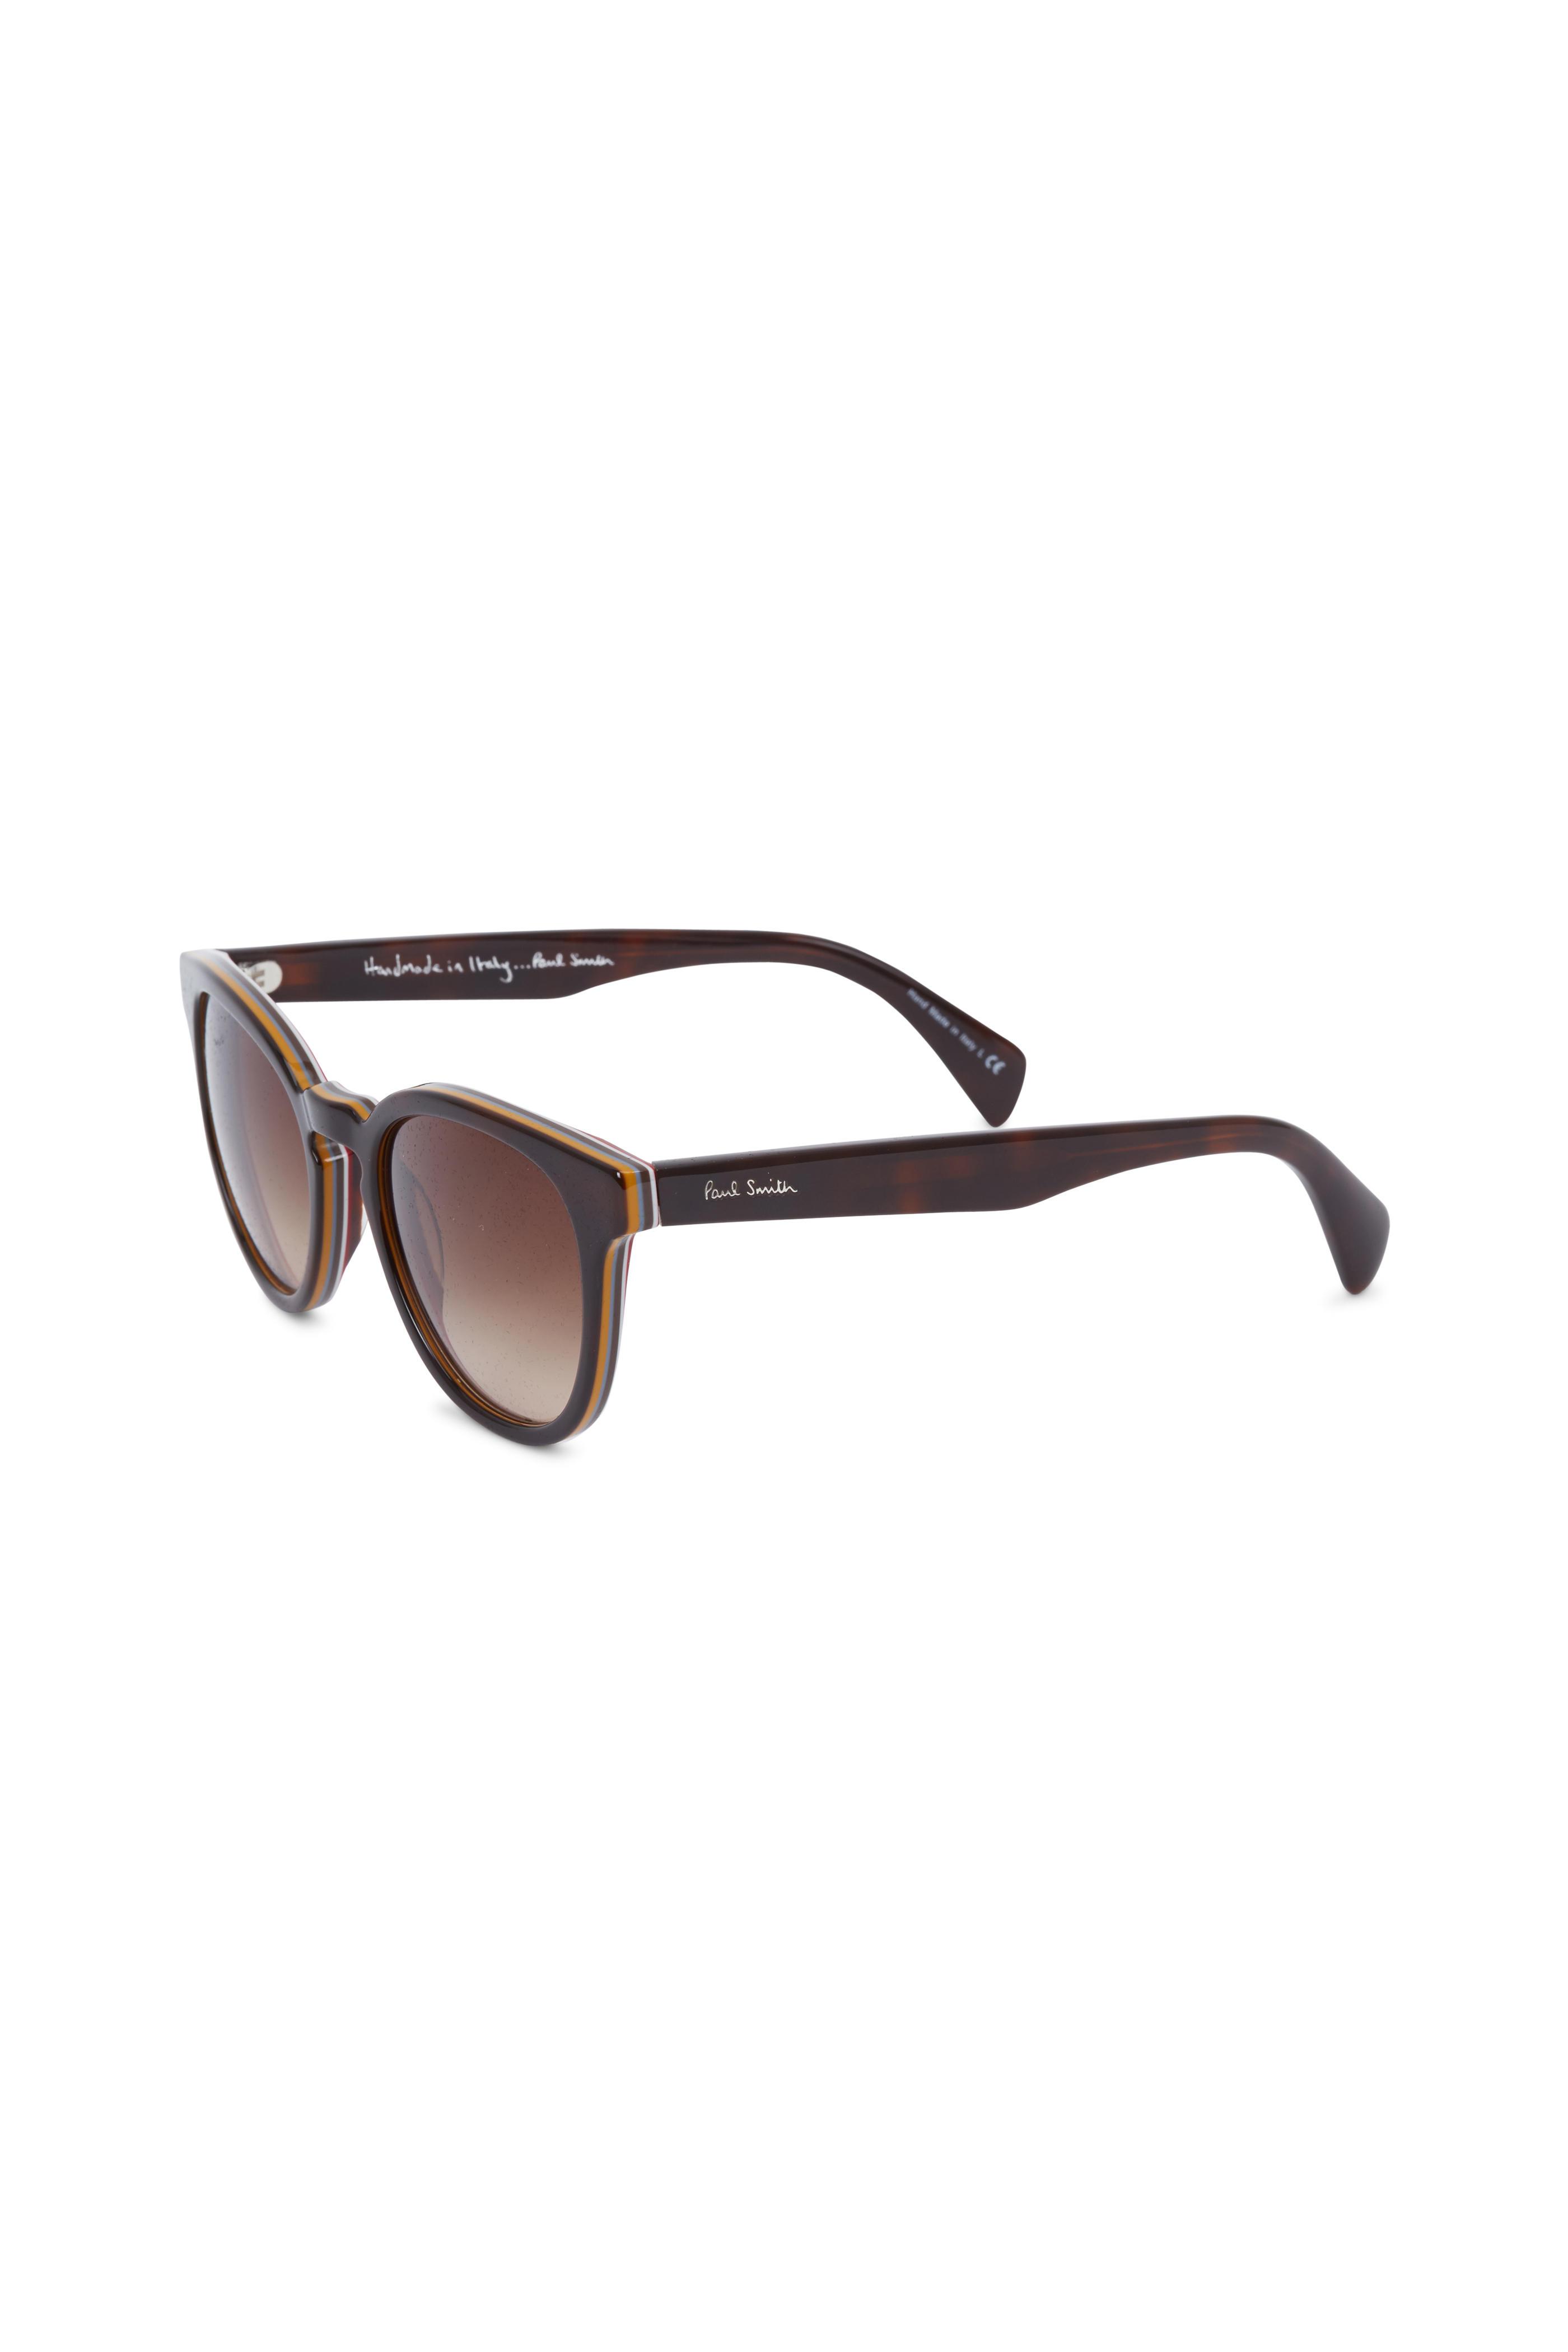 f7a538cbfb Paul Smith - Serle Nector Tortoise Wayfarer Sunglasses